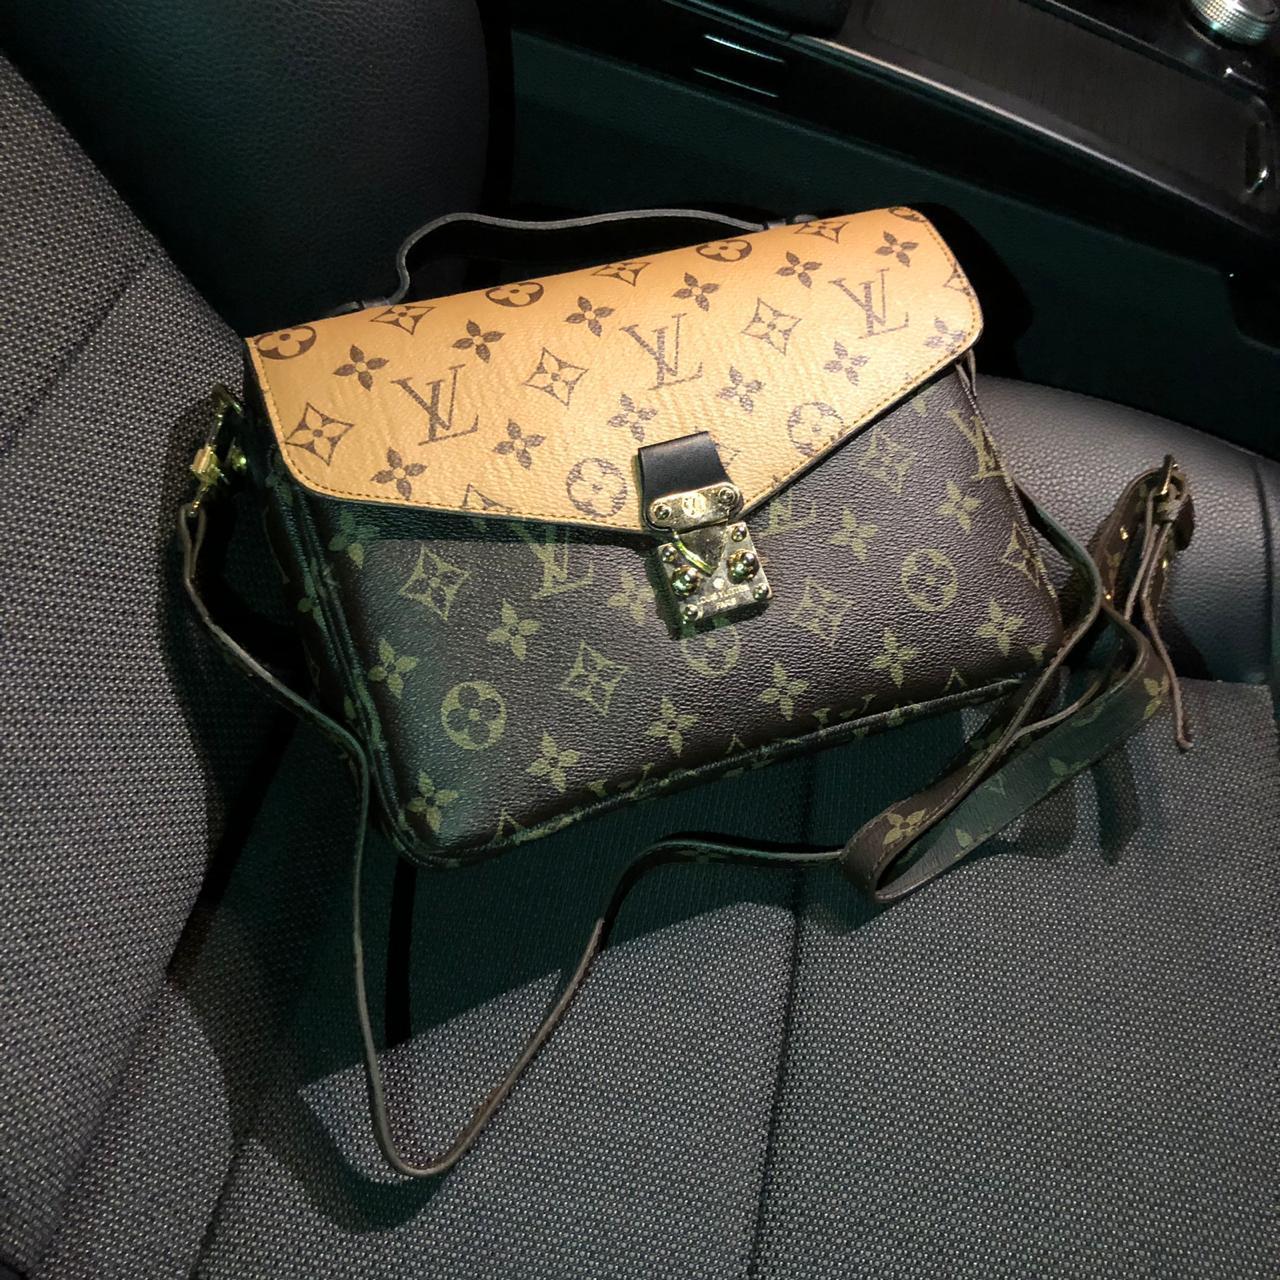 27042f9d4bbe Женская сумка в стиле LOUIS VUITTON (Луи Виттон), коричневый цвет ...